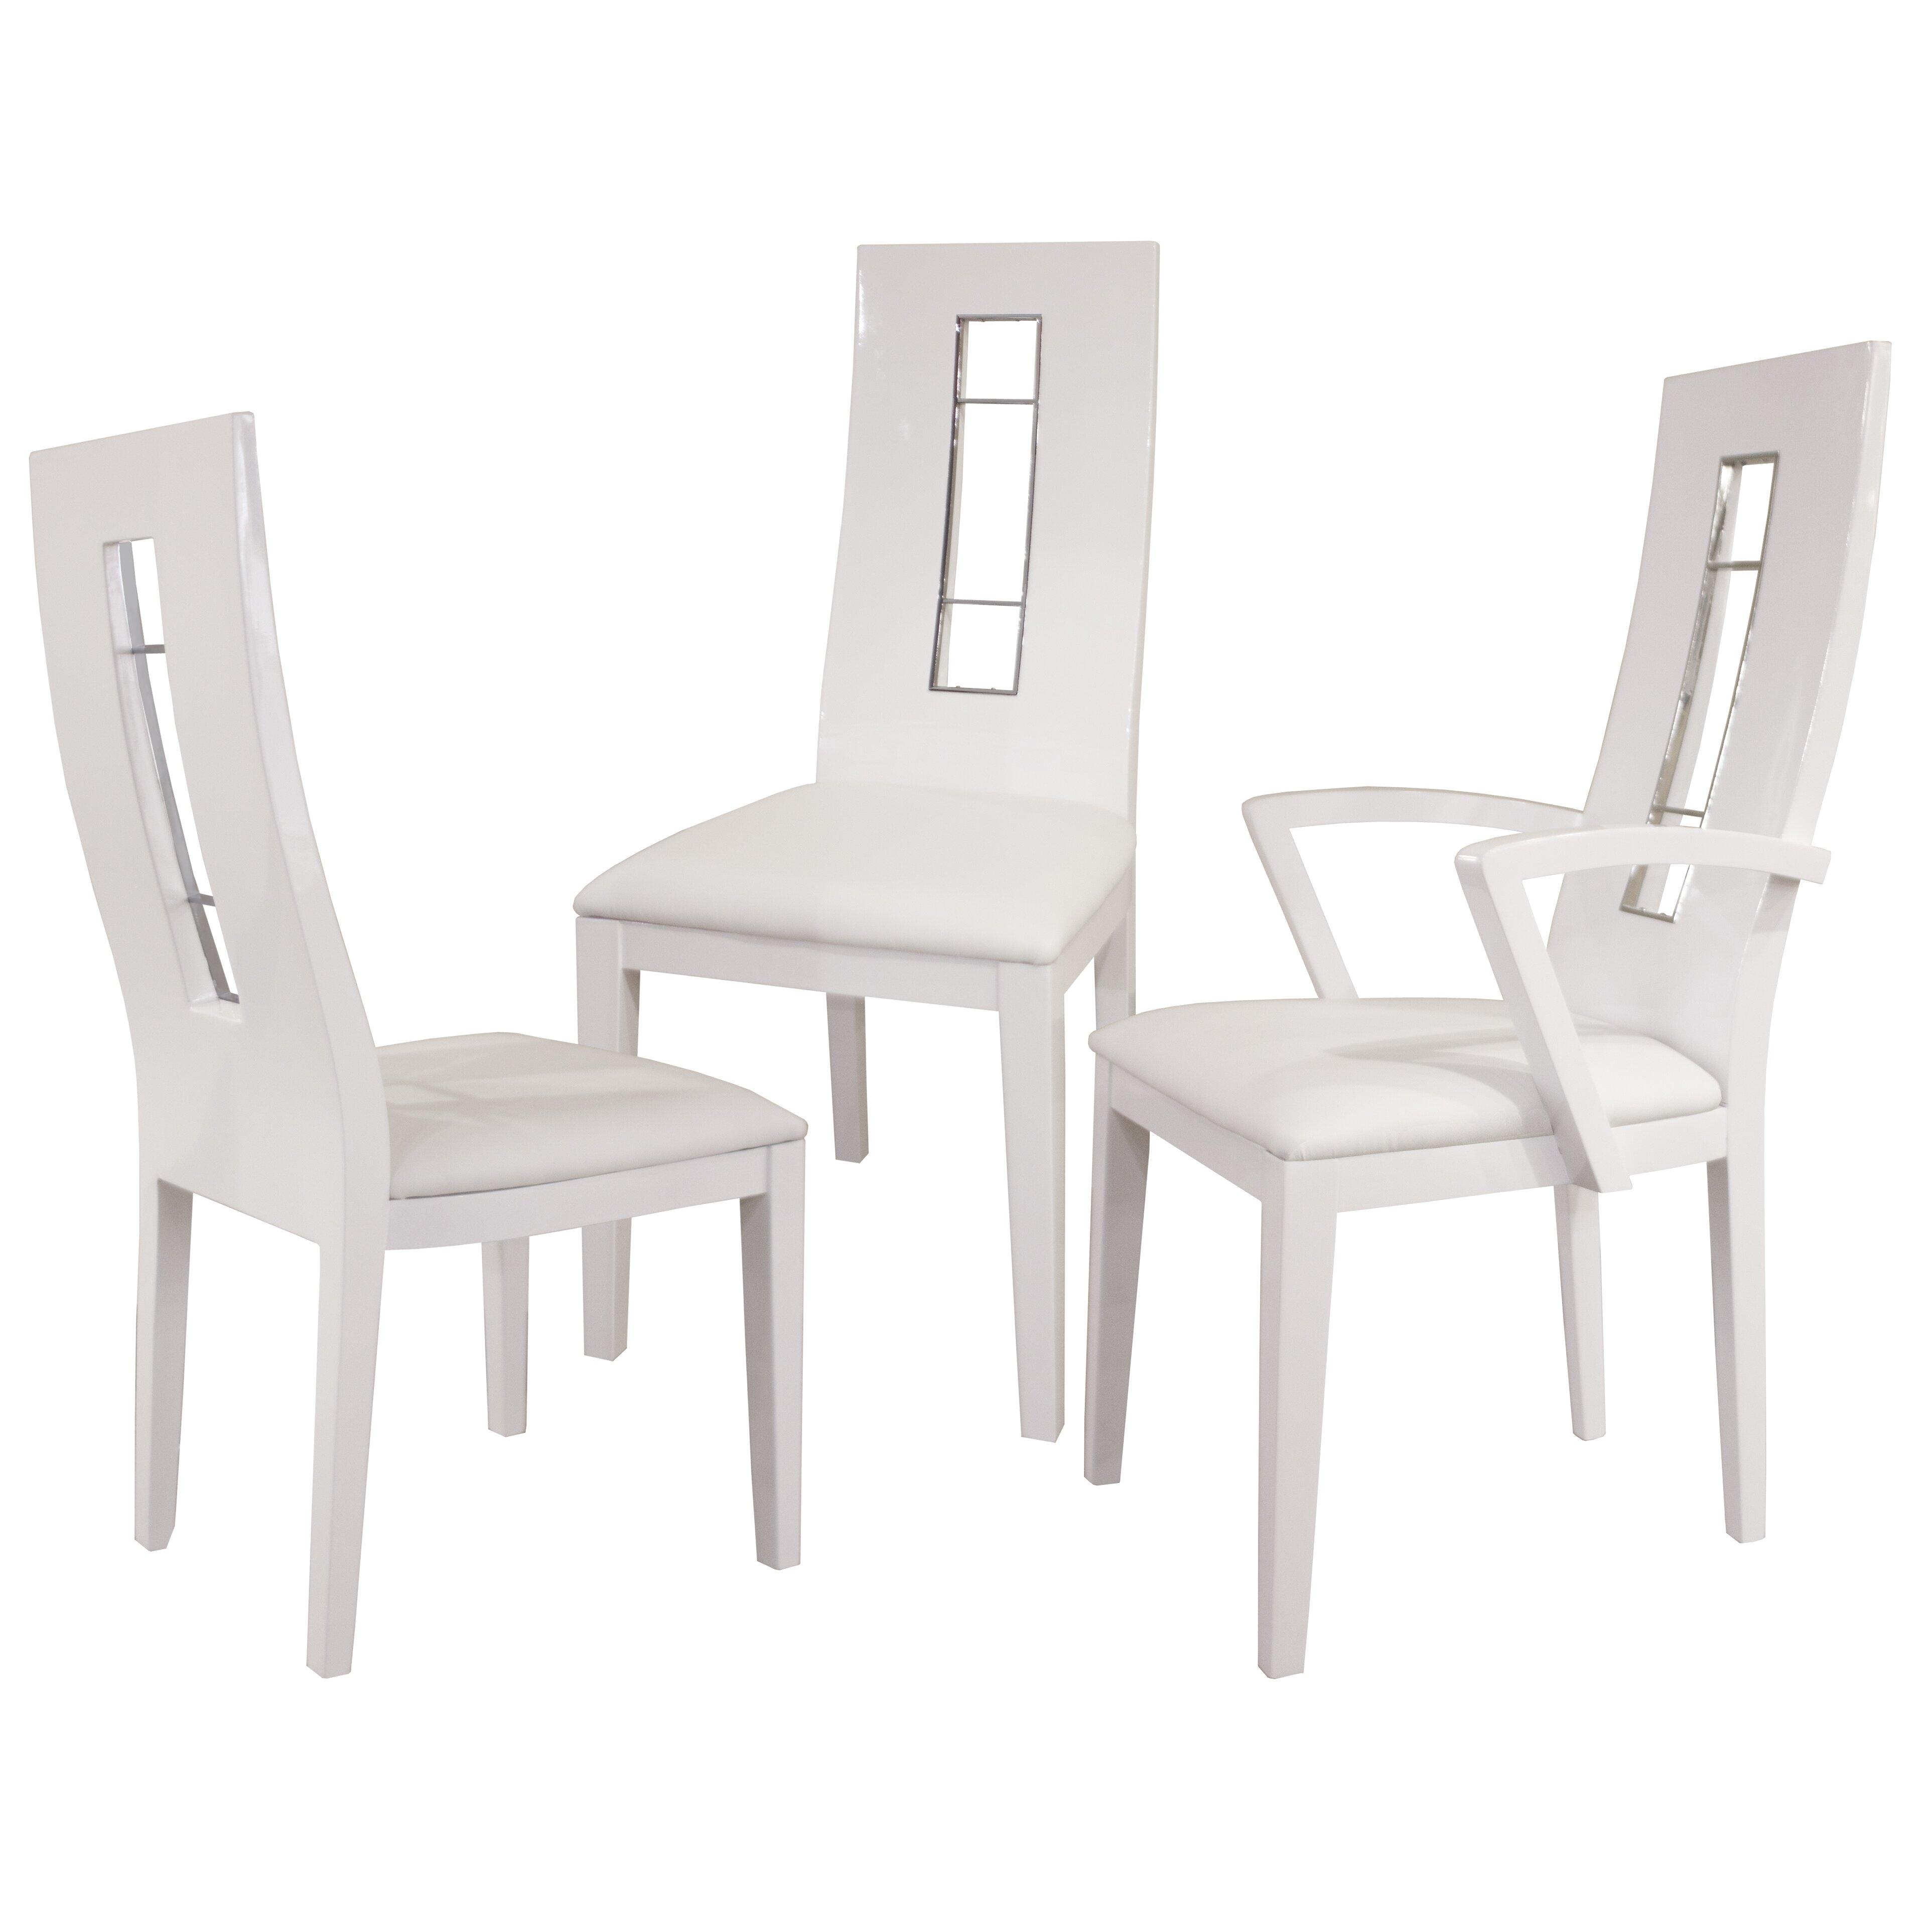 sharelle furniture - sharelle furnishings novo arm chair wayfair